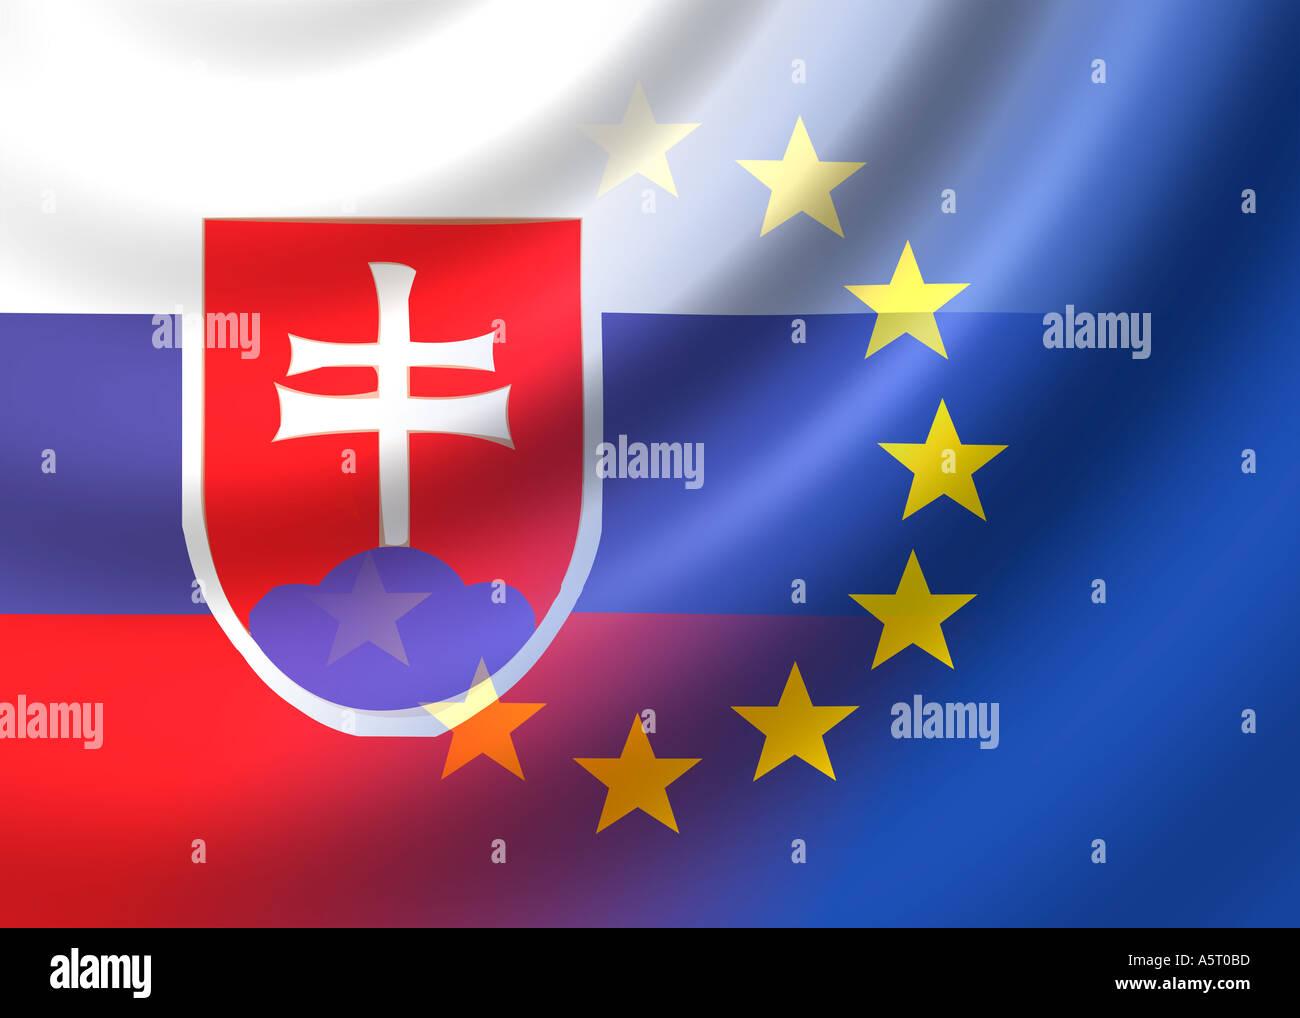 337c80dbc3 Flag of Slovakia and EU flag european union Stock Photo  2113724 - Alamy